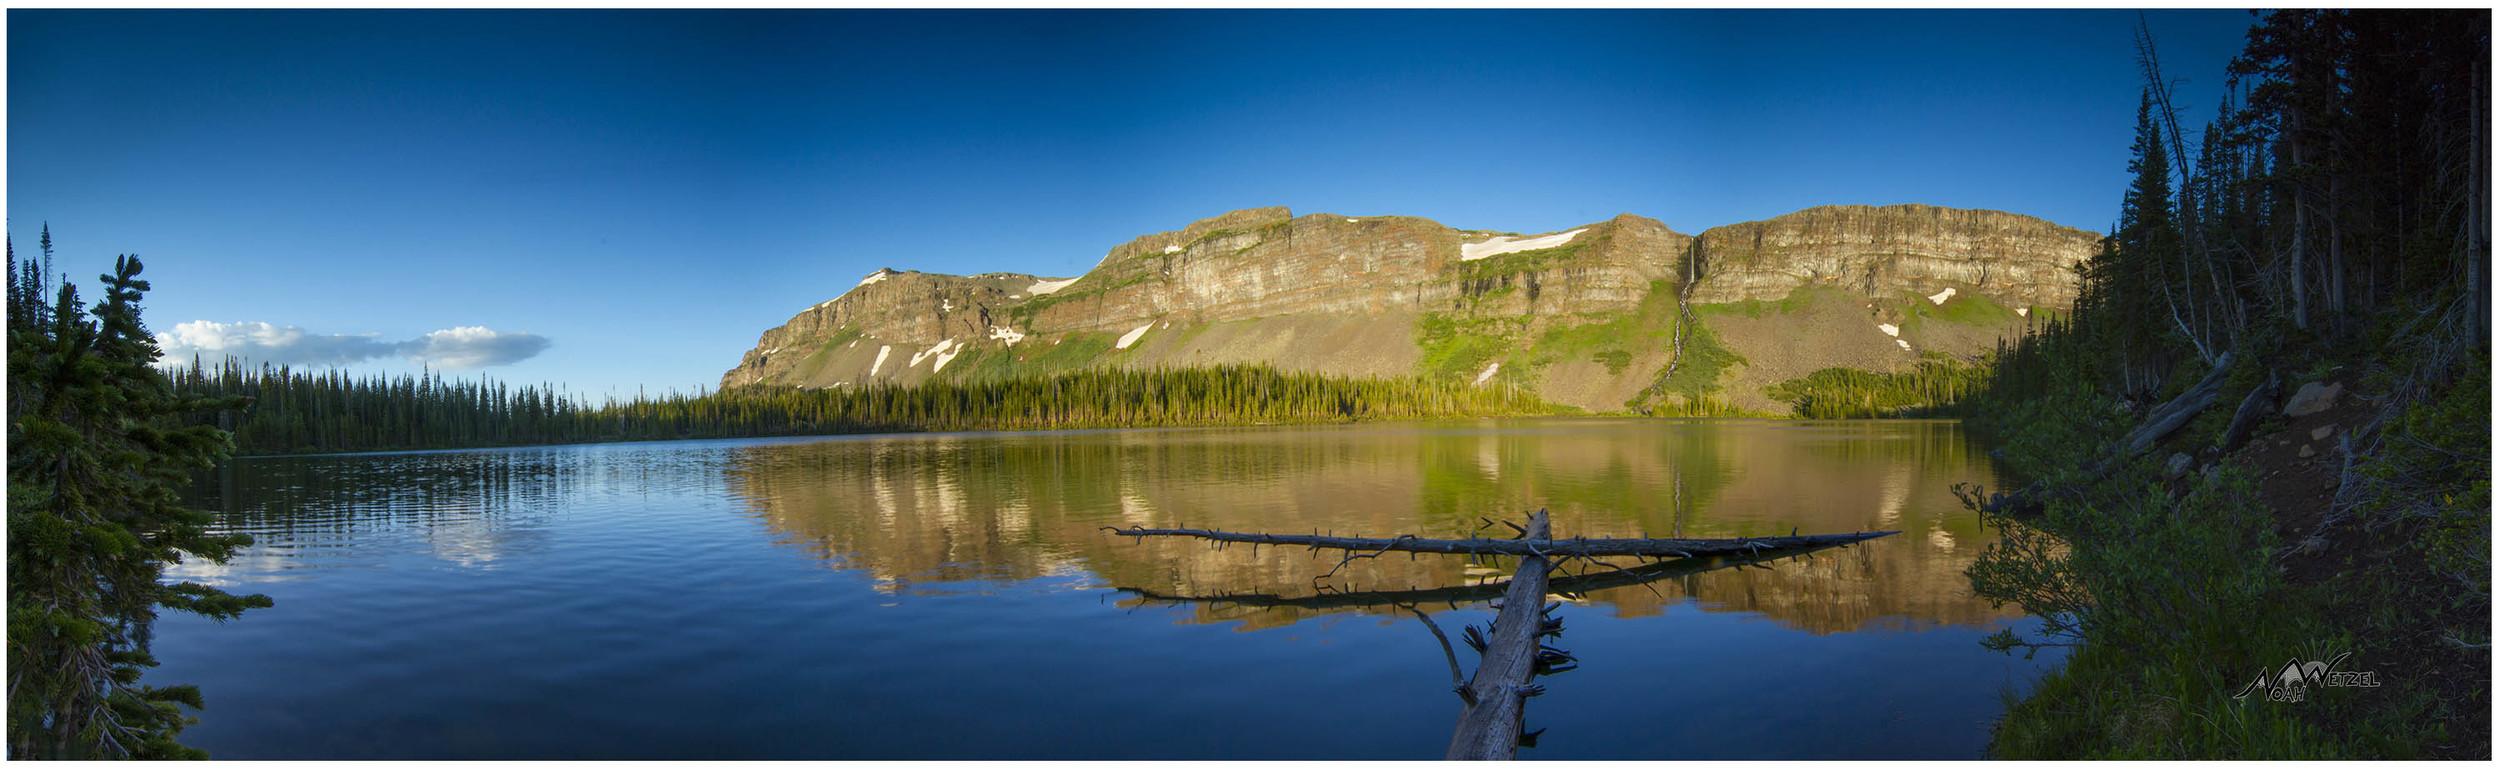 Keener Lake, Flat Tops Wilderness, Colorado